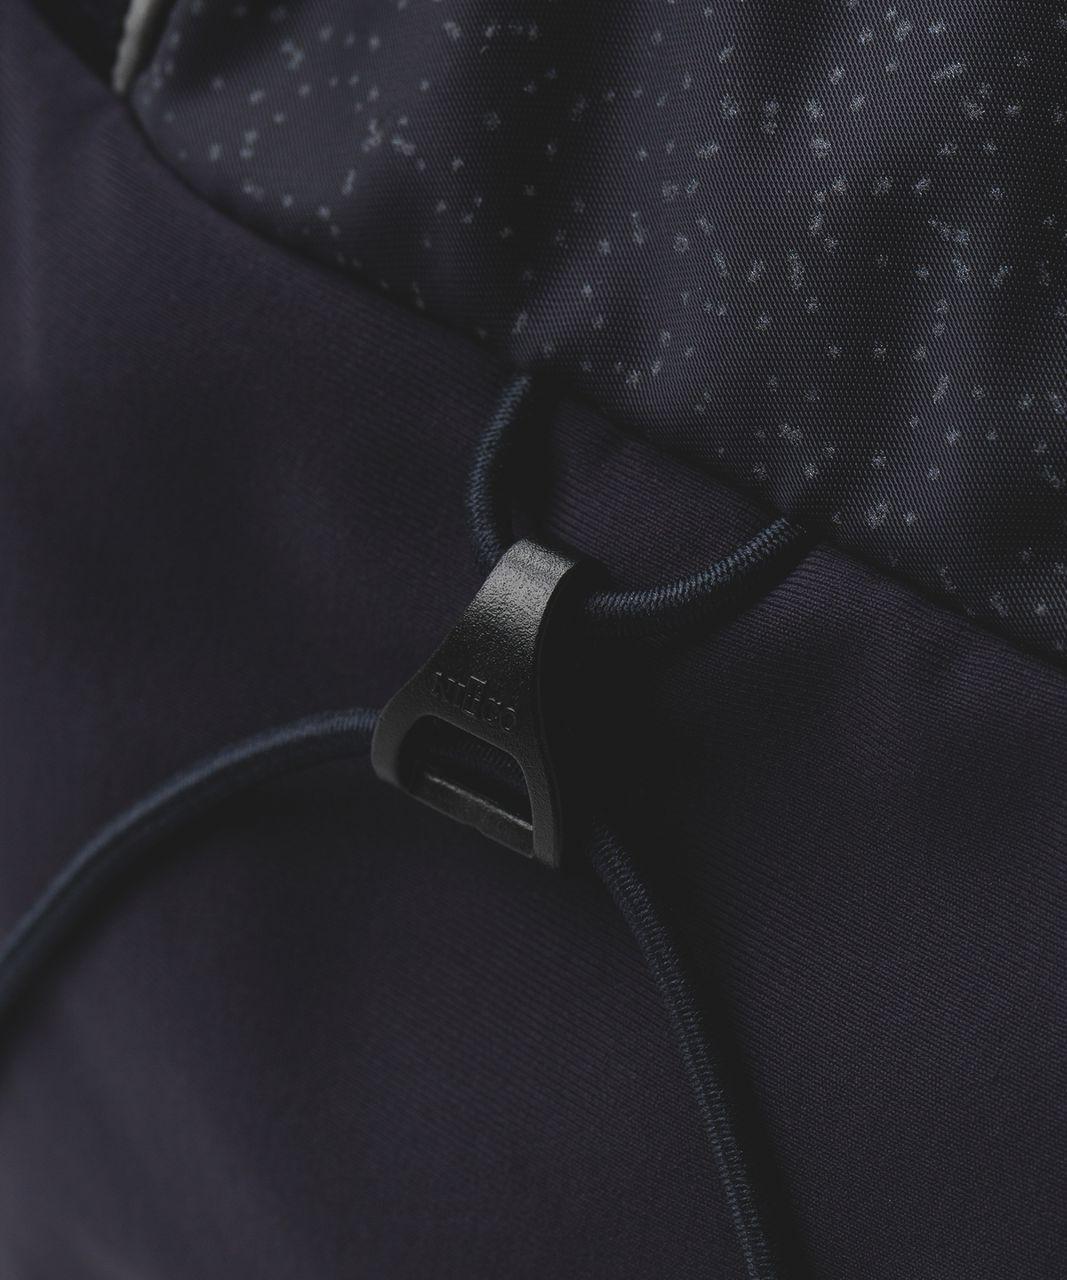 Lululemon Run All Day Backpack *Reflective - Star Pixel Naval Blue Multi